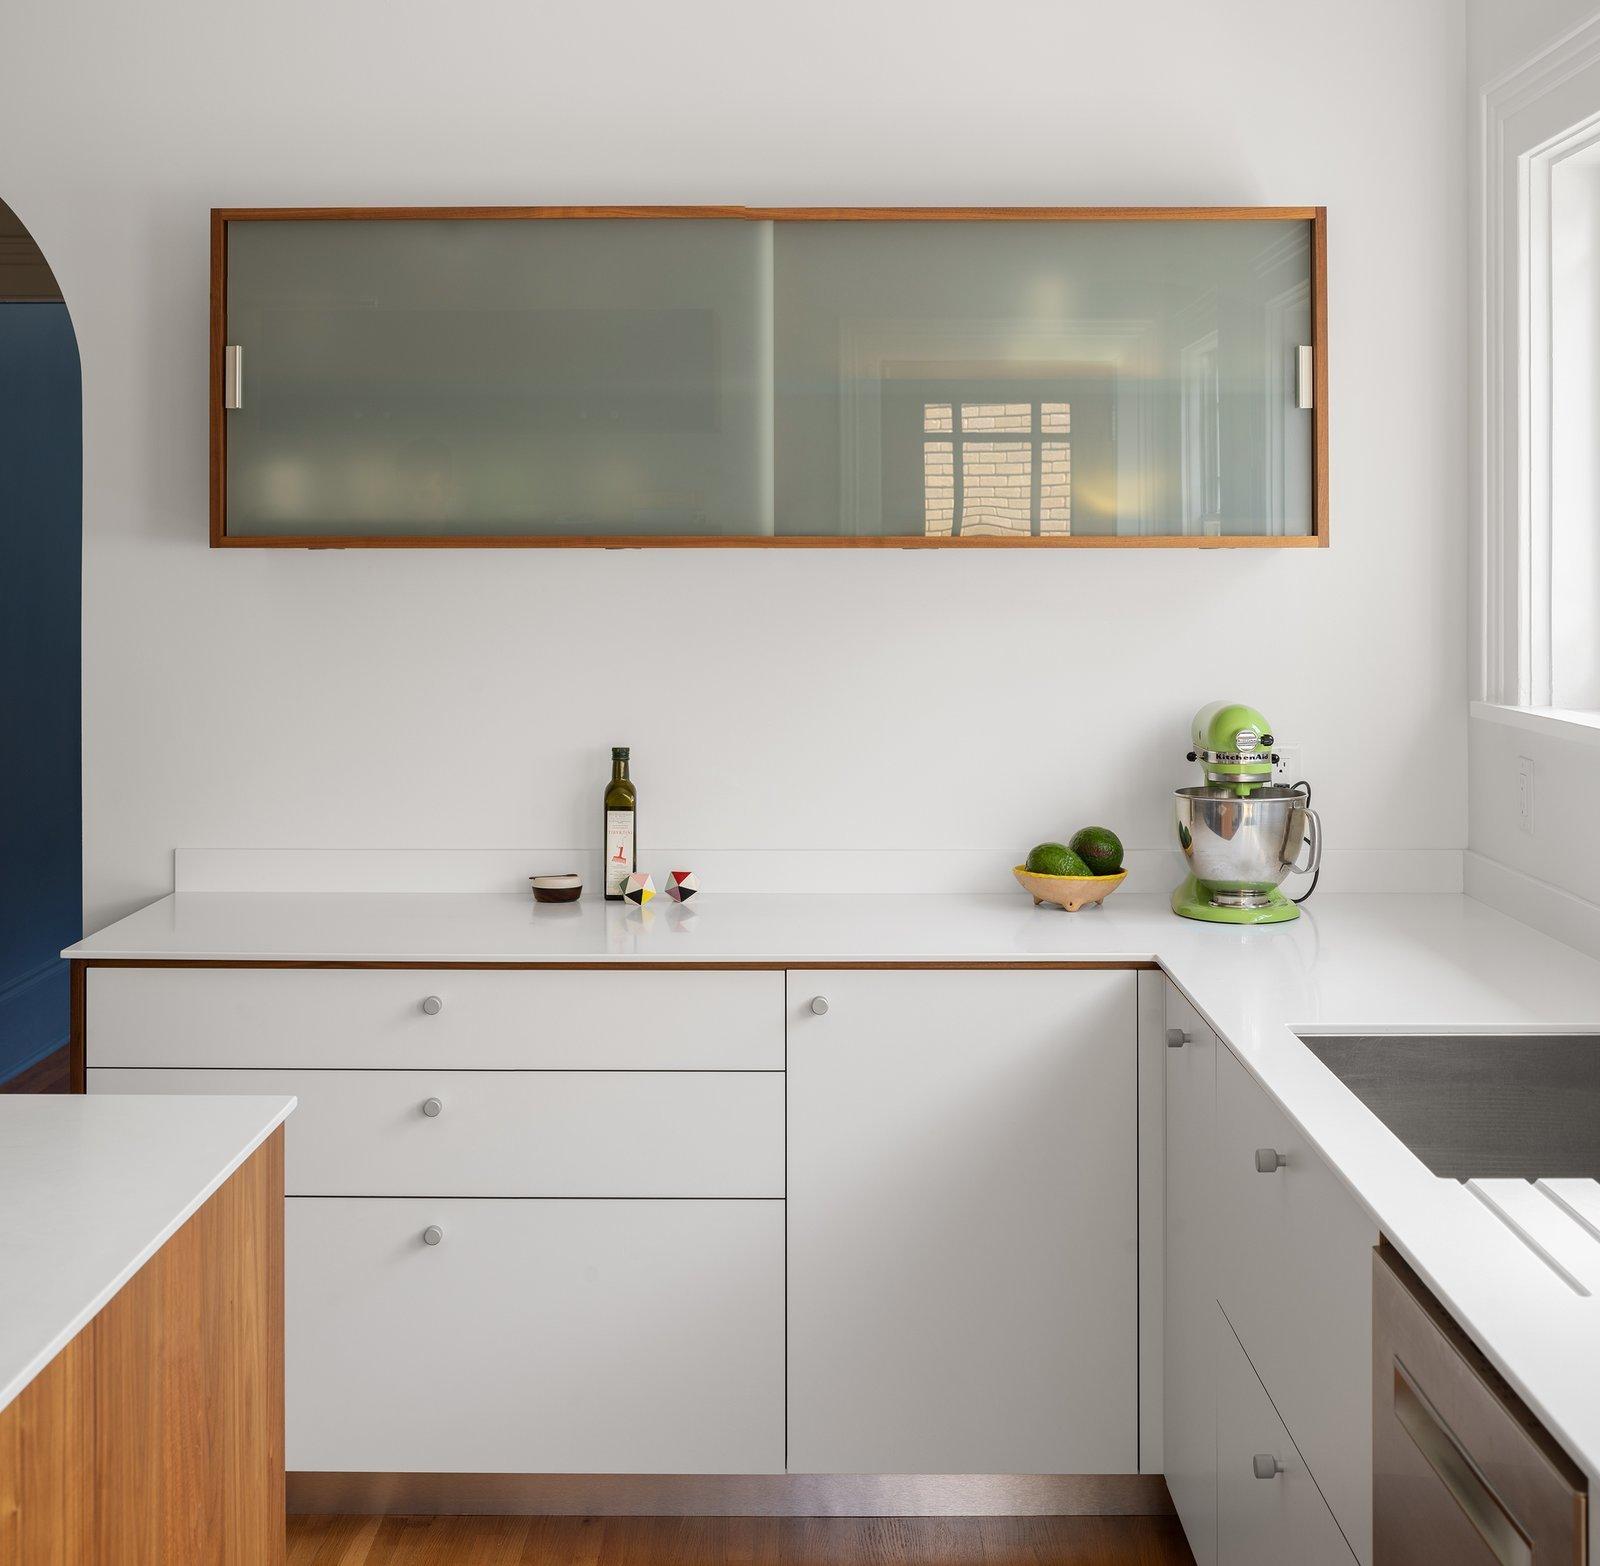 Dundee House kitchen